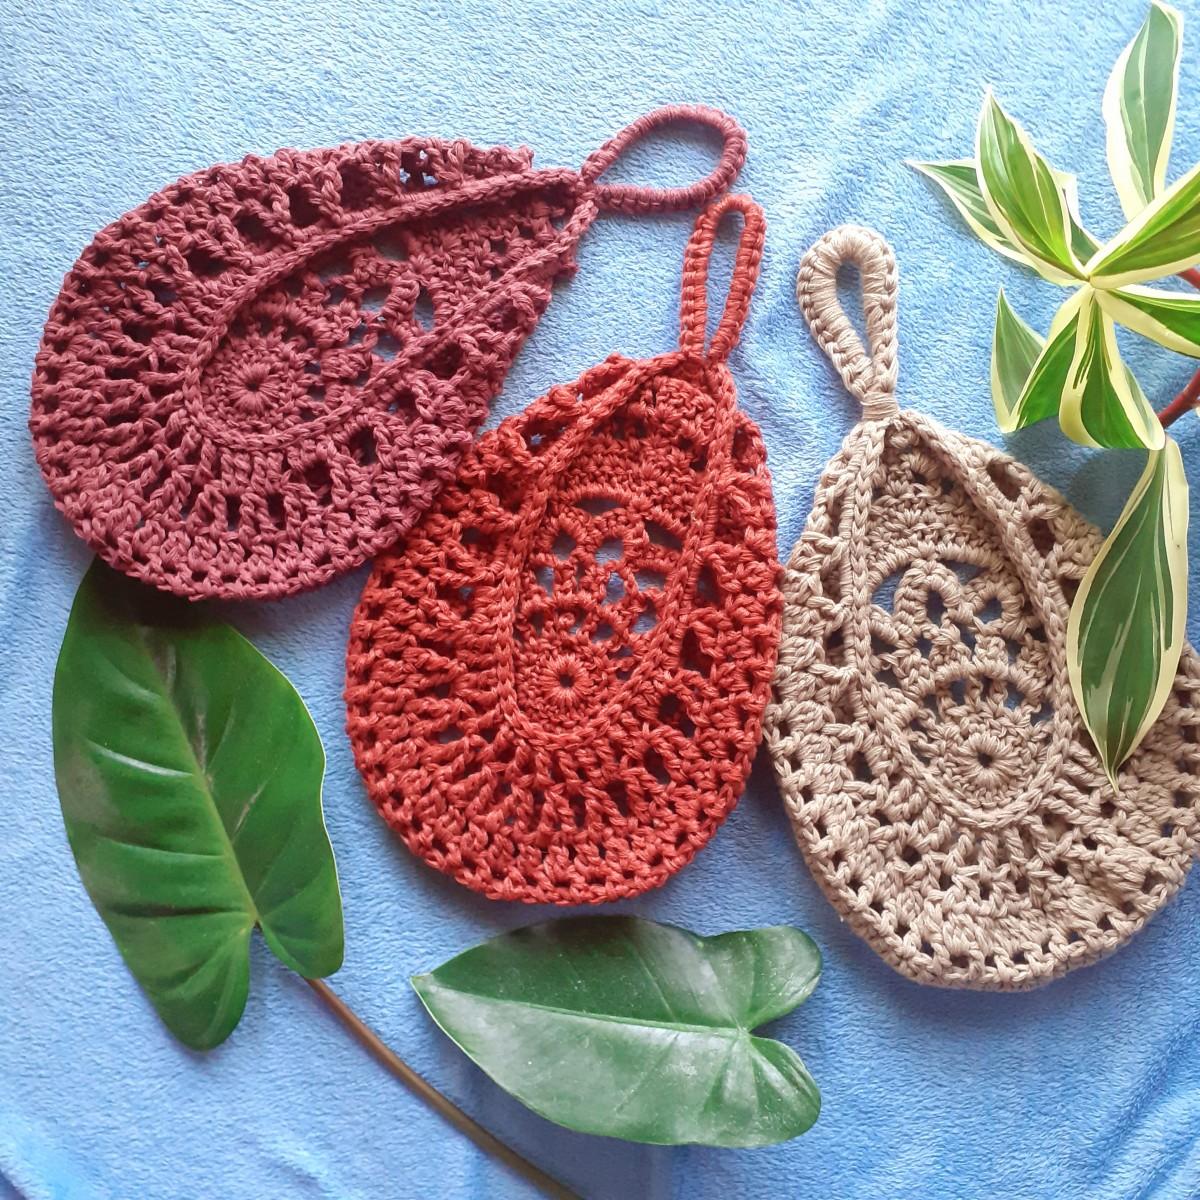 Crochet Teardrop Hanging Basket